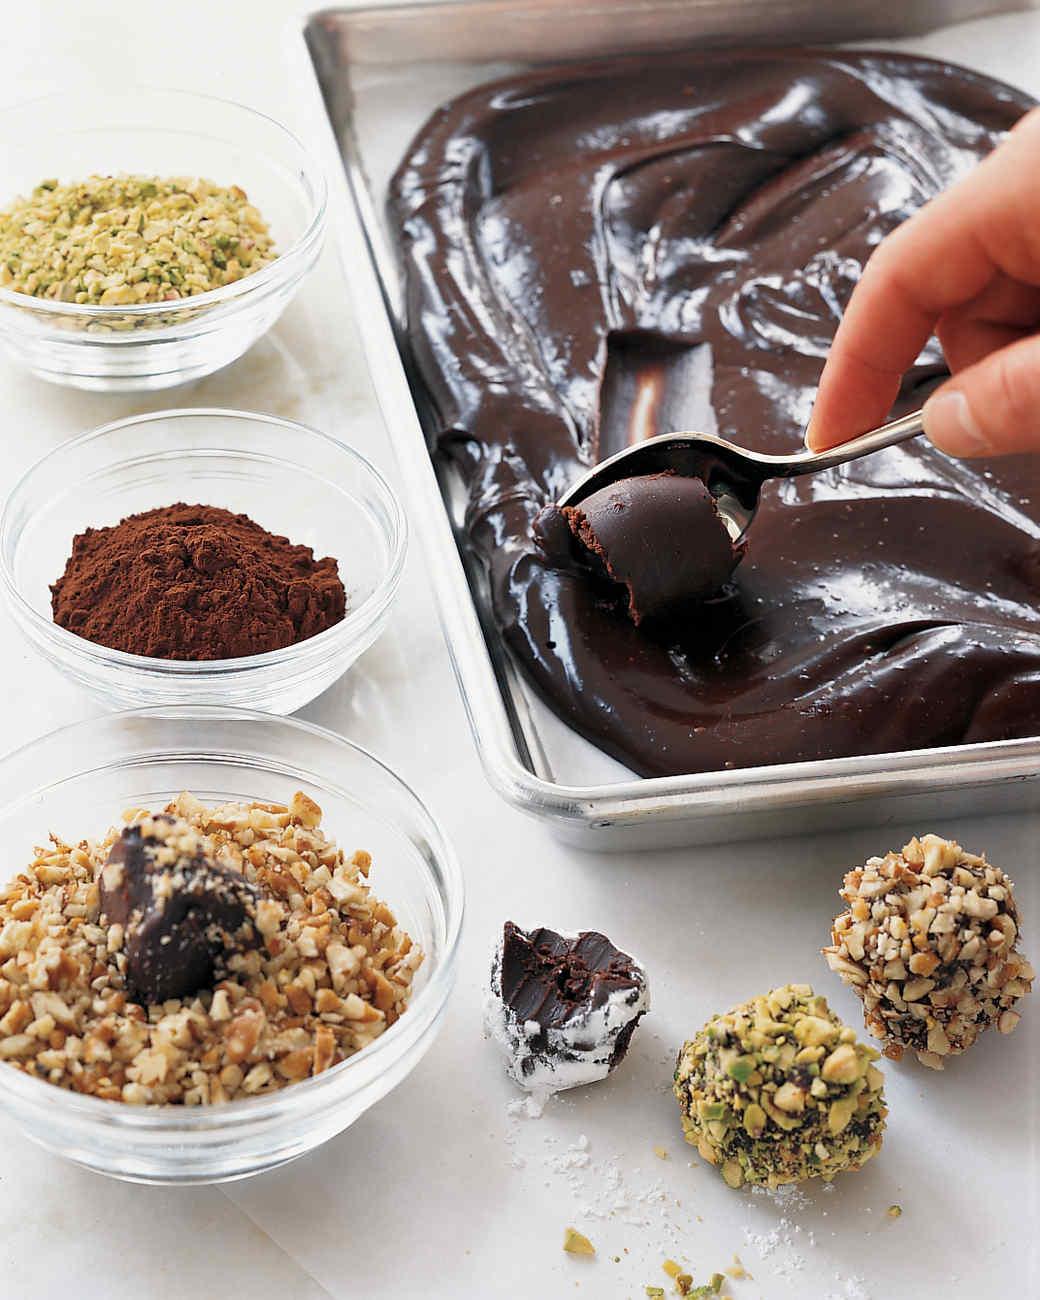 Chocolate truffles recipes easy